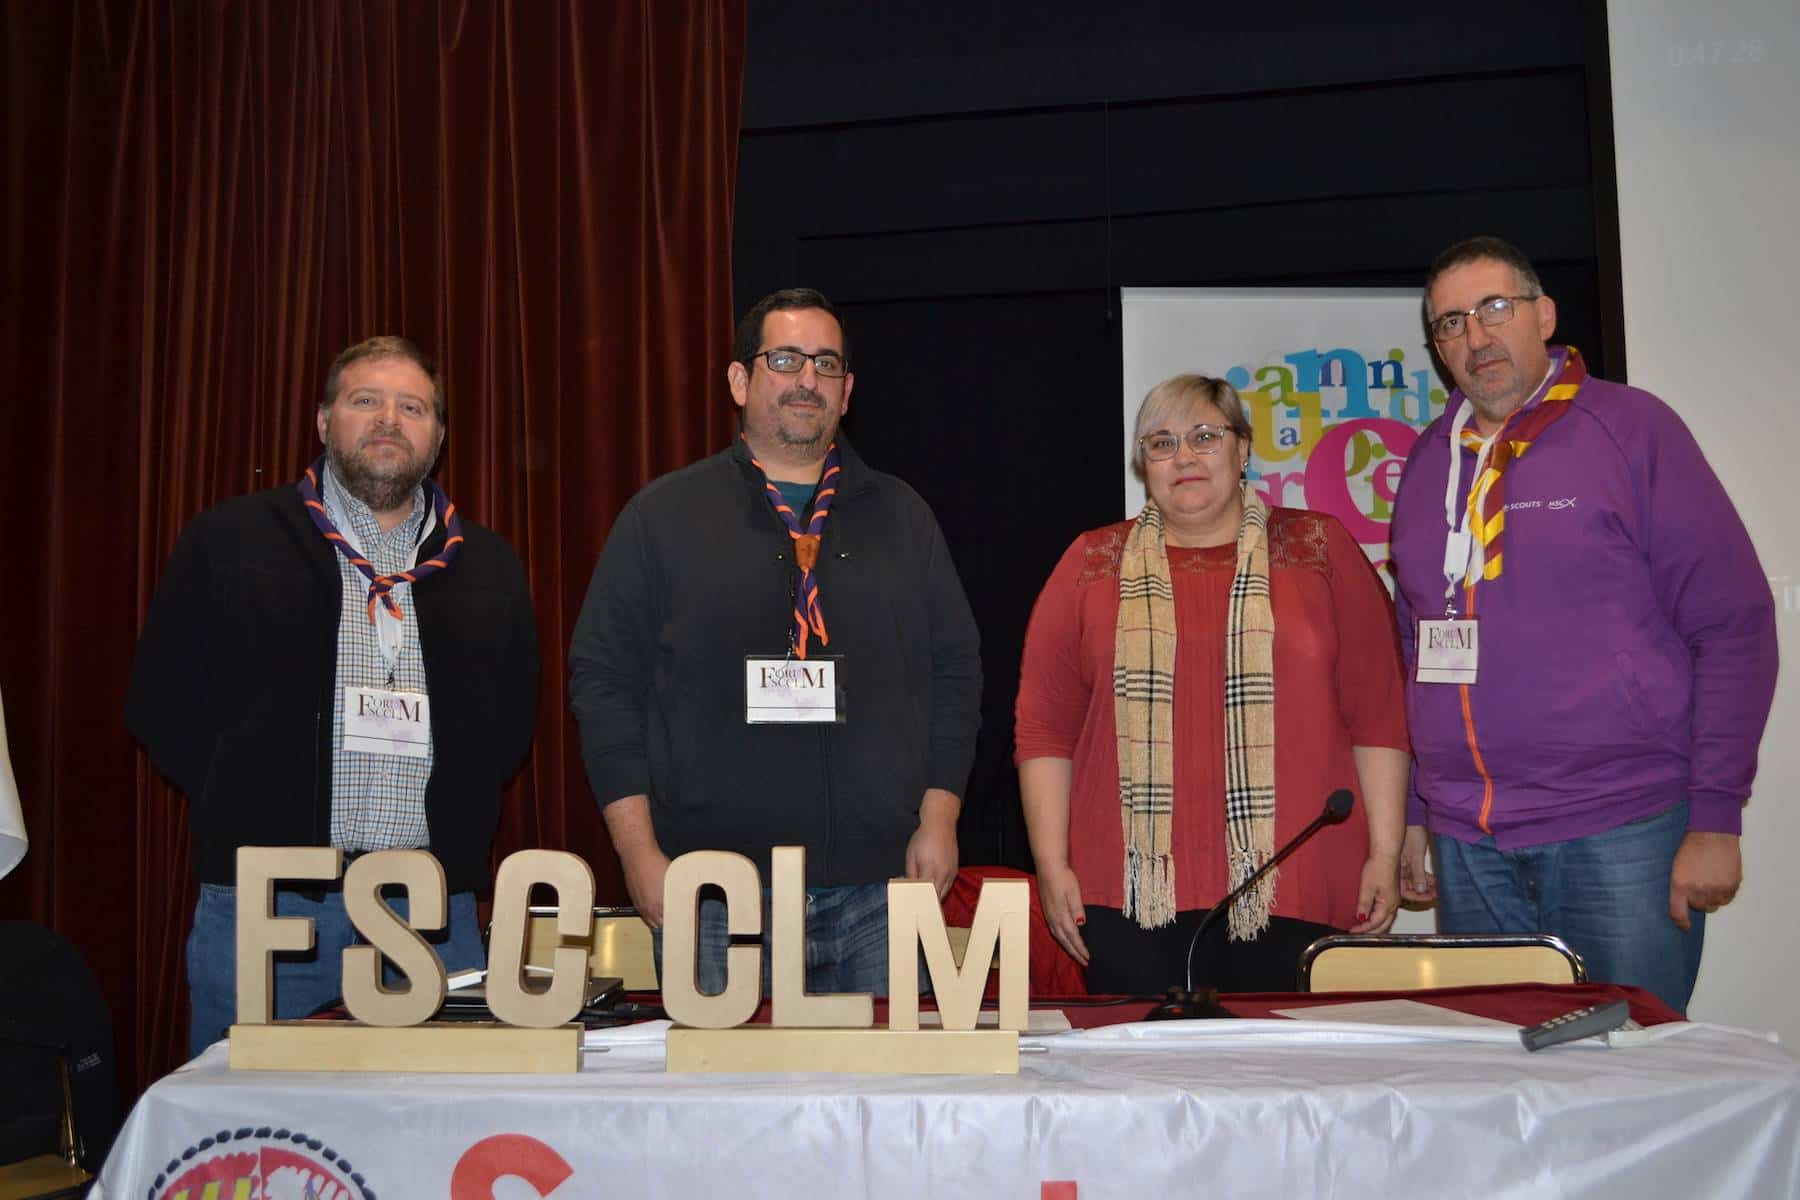 scouts fsc clm - Los scouts de Castilla-La Mancha se reunieron en Herencia